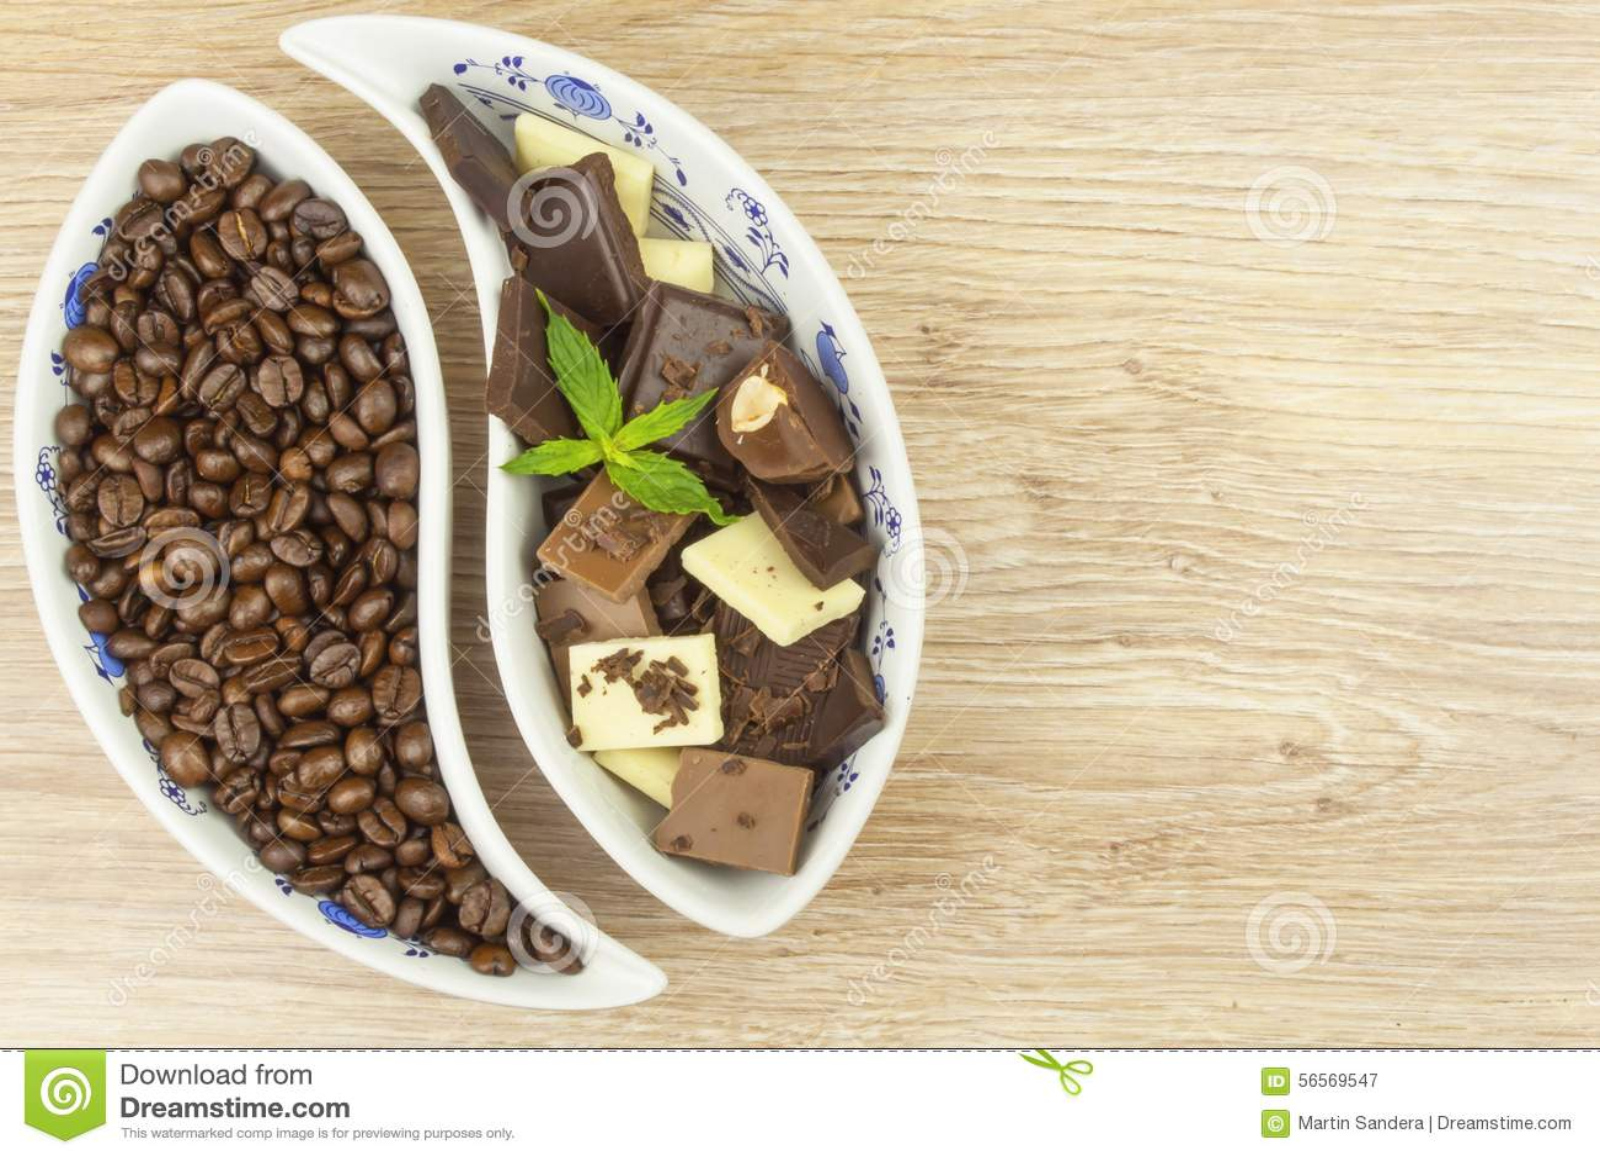 Download Κομμάτια της σοκολάτας σε έναν ξύλινο πίνακα Στοκ Εικόνα - εικόνα από επιδόρπιο, αδελφών: 56569547